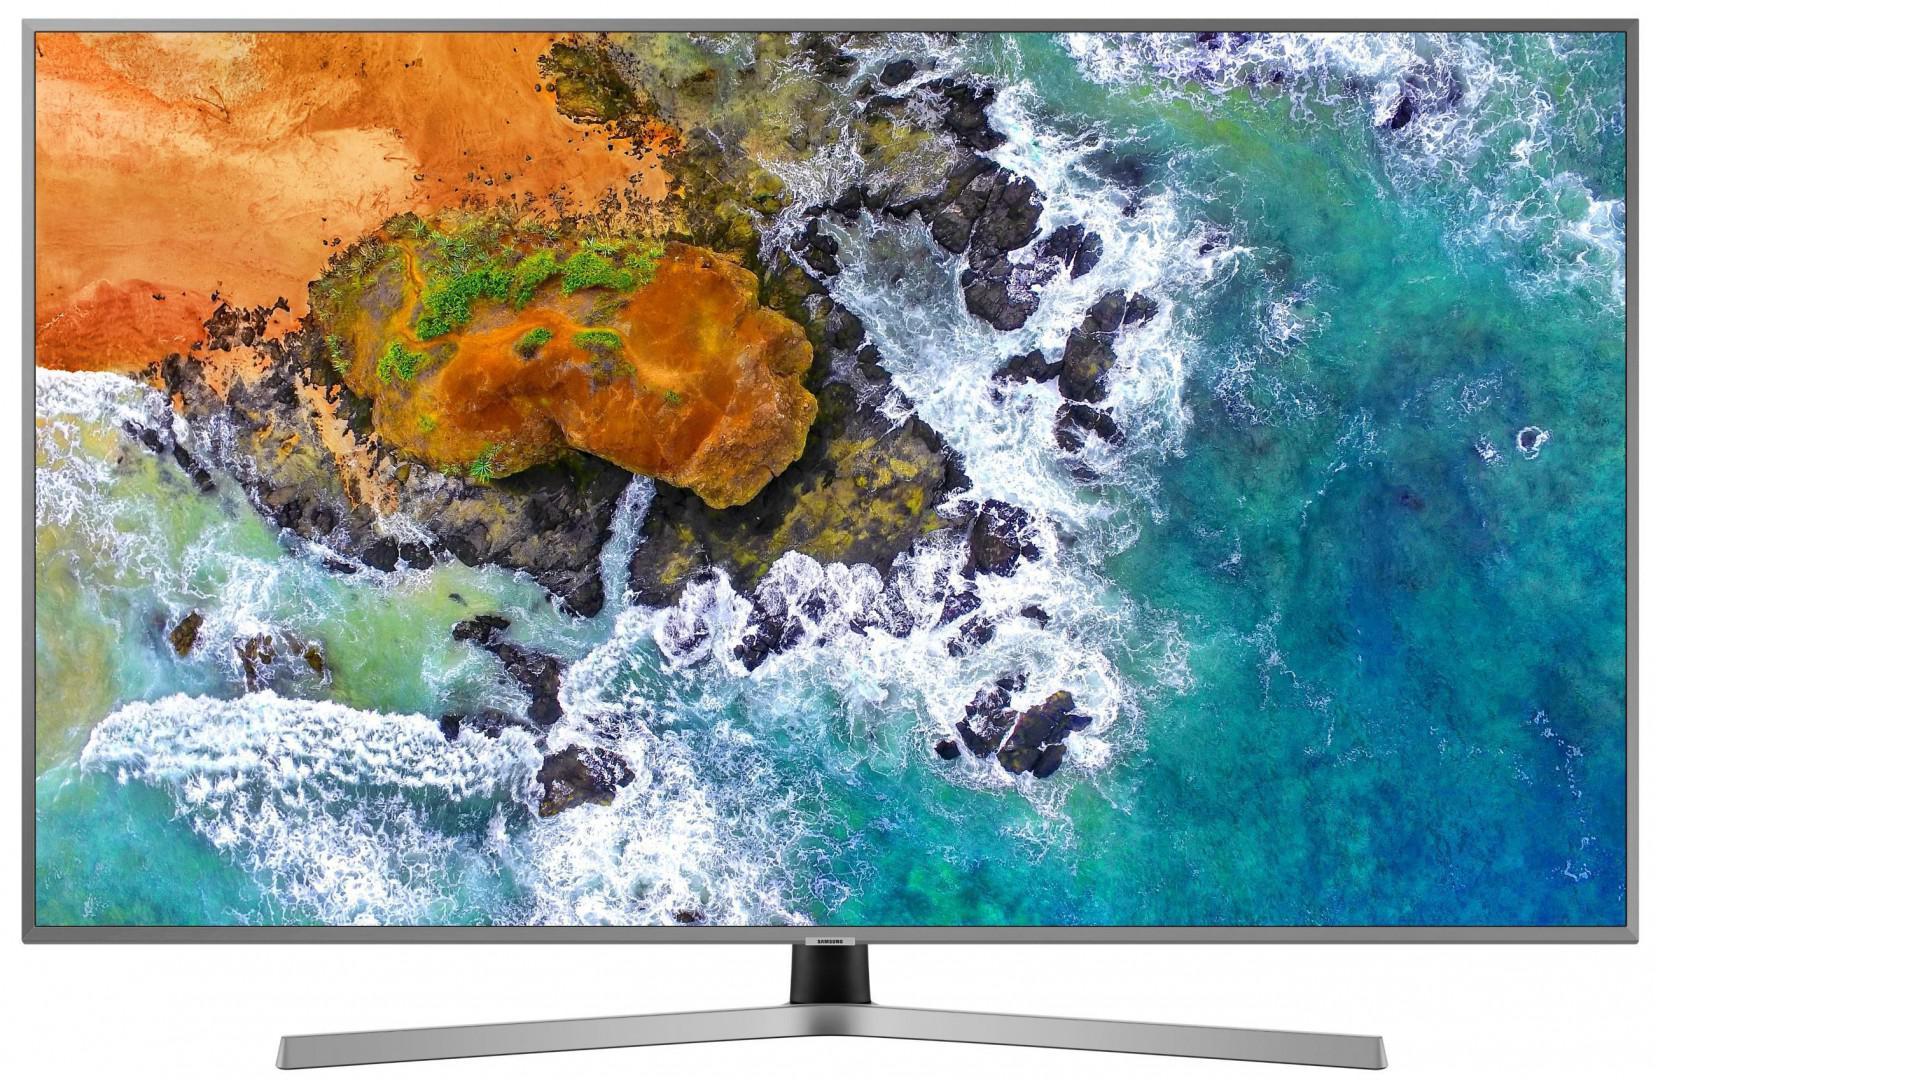 Telewizor SAMSUNG UE55NU7452 w Neonet